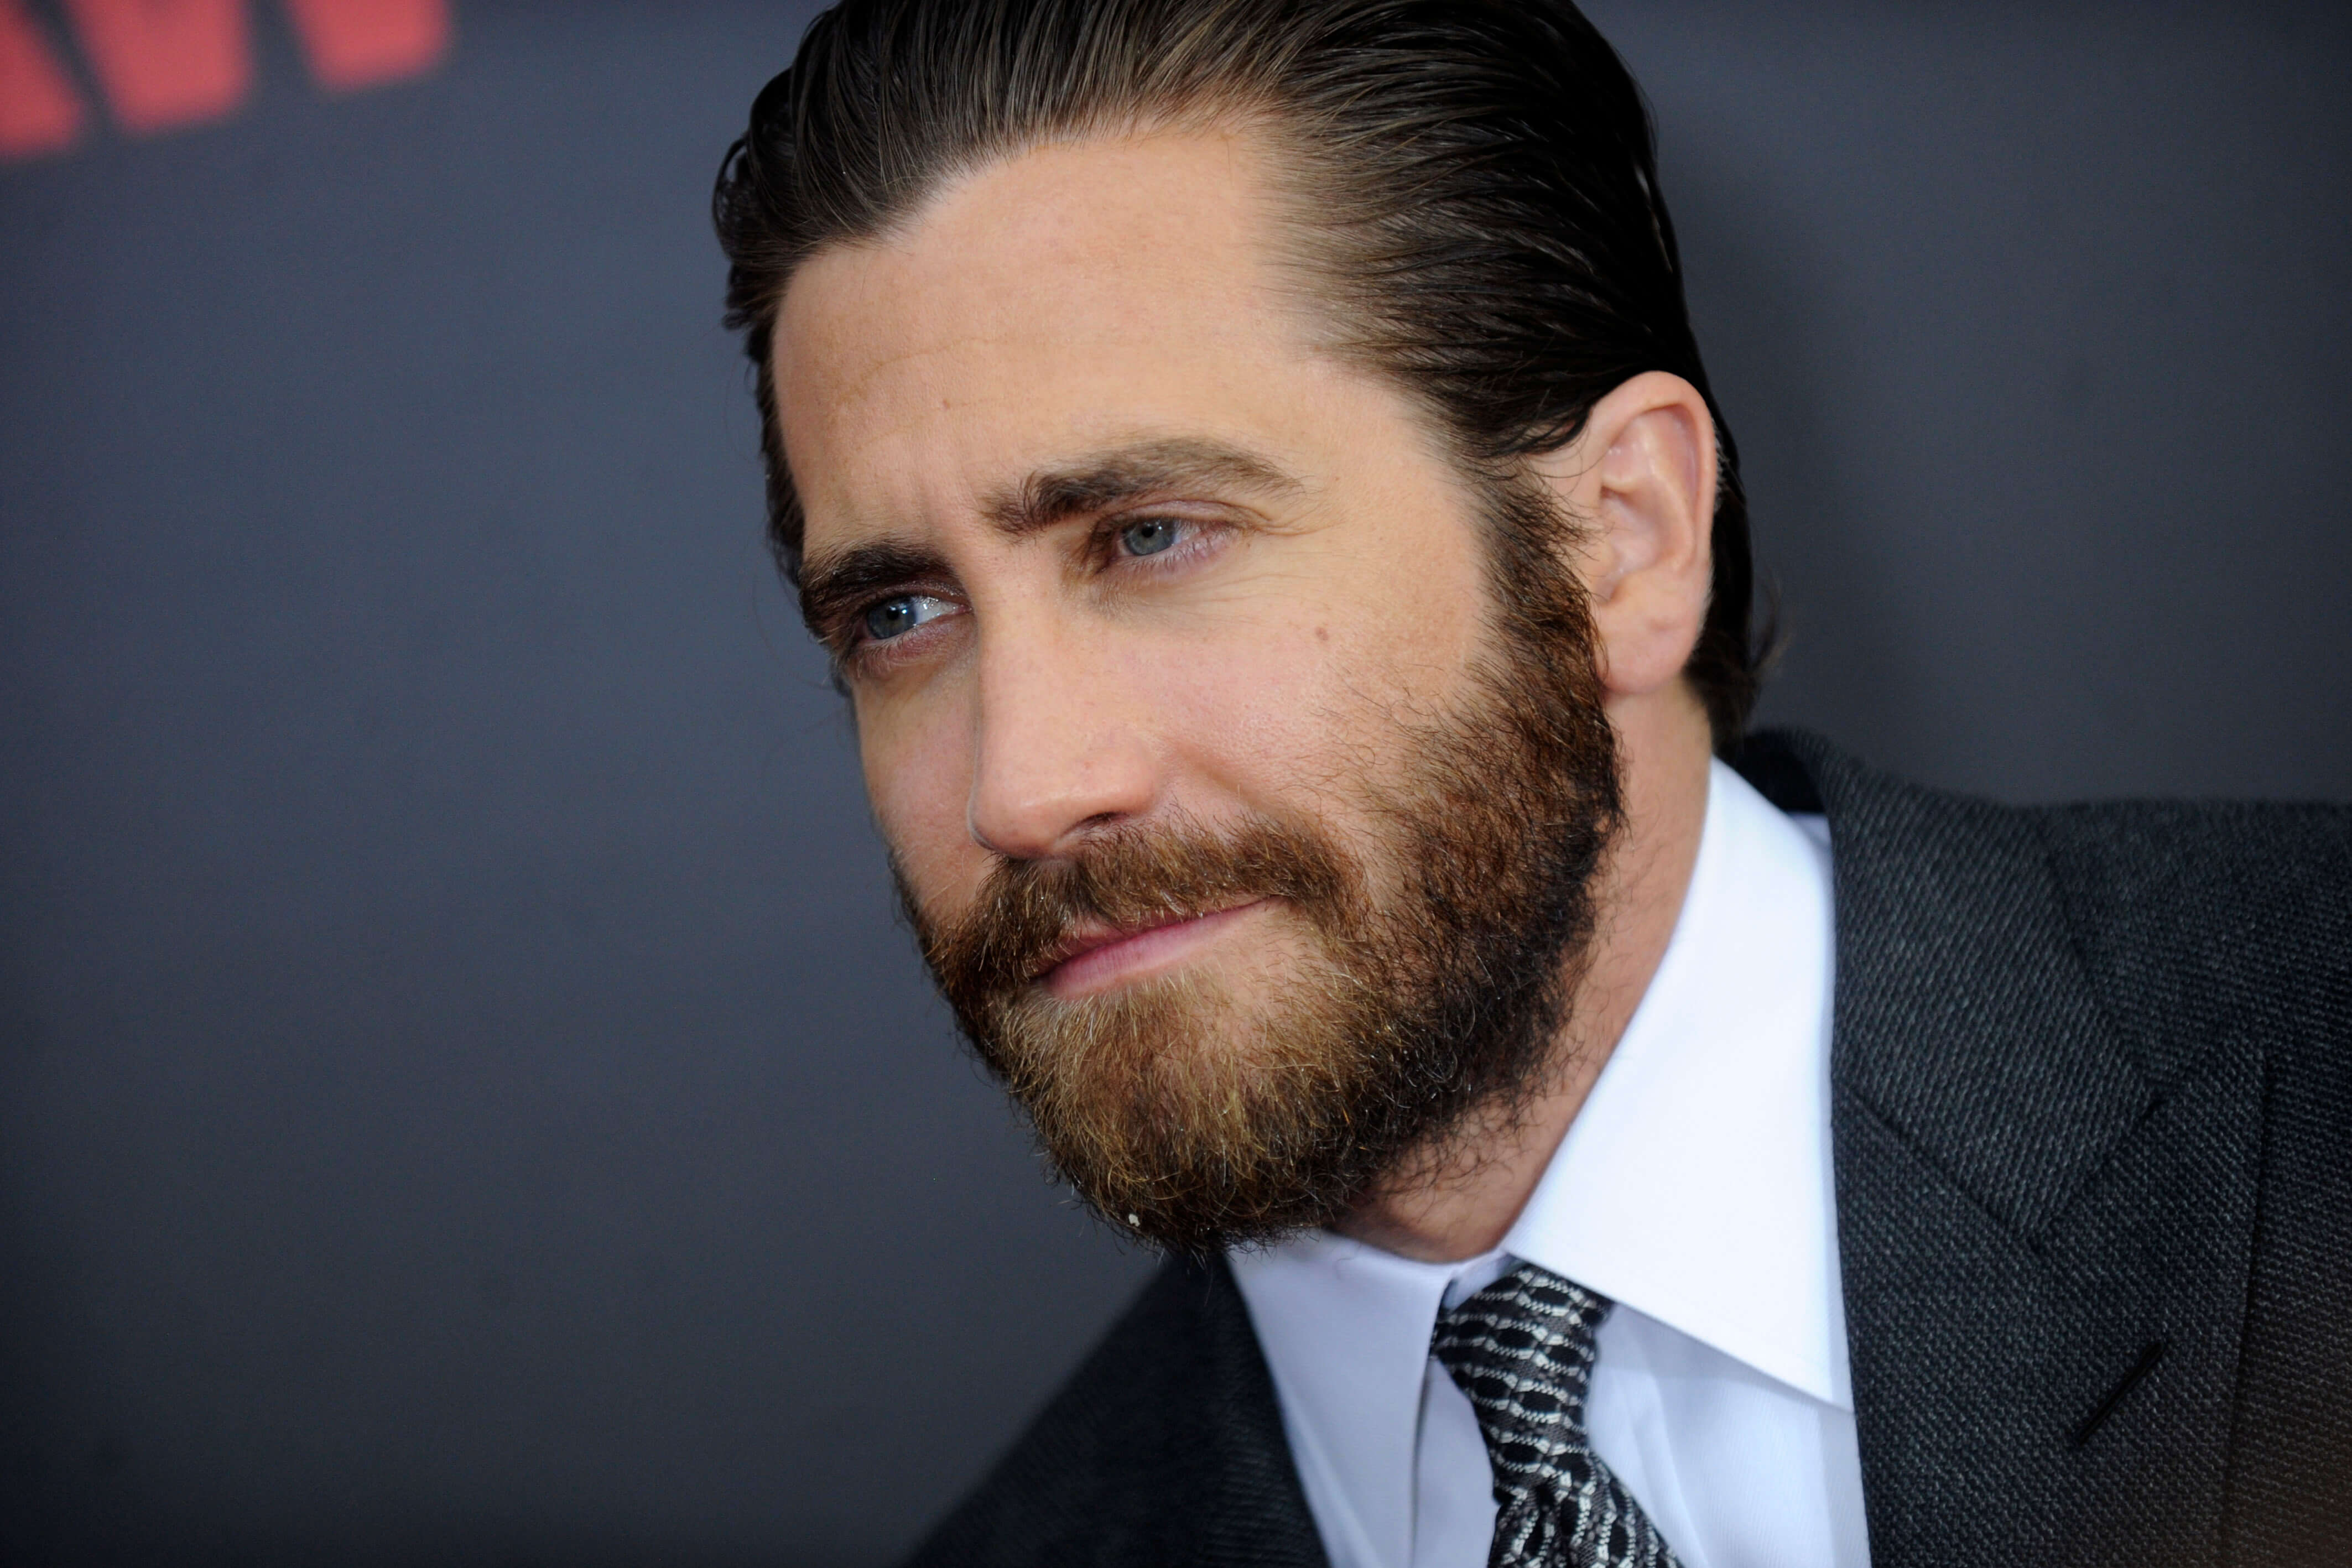 Jake gyllenhaal beard stubble bearded man